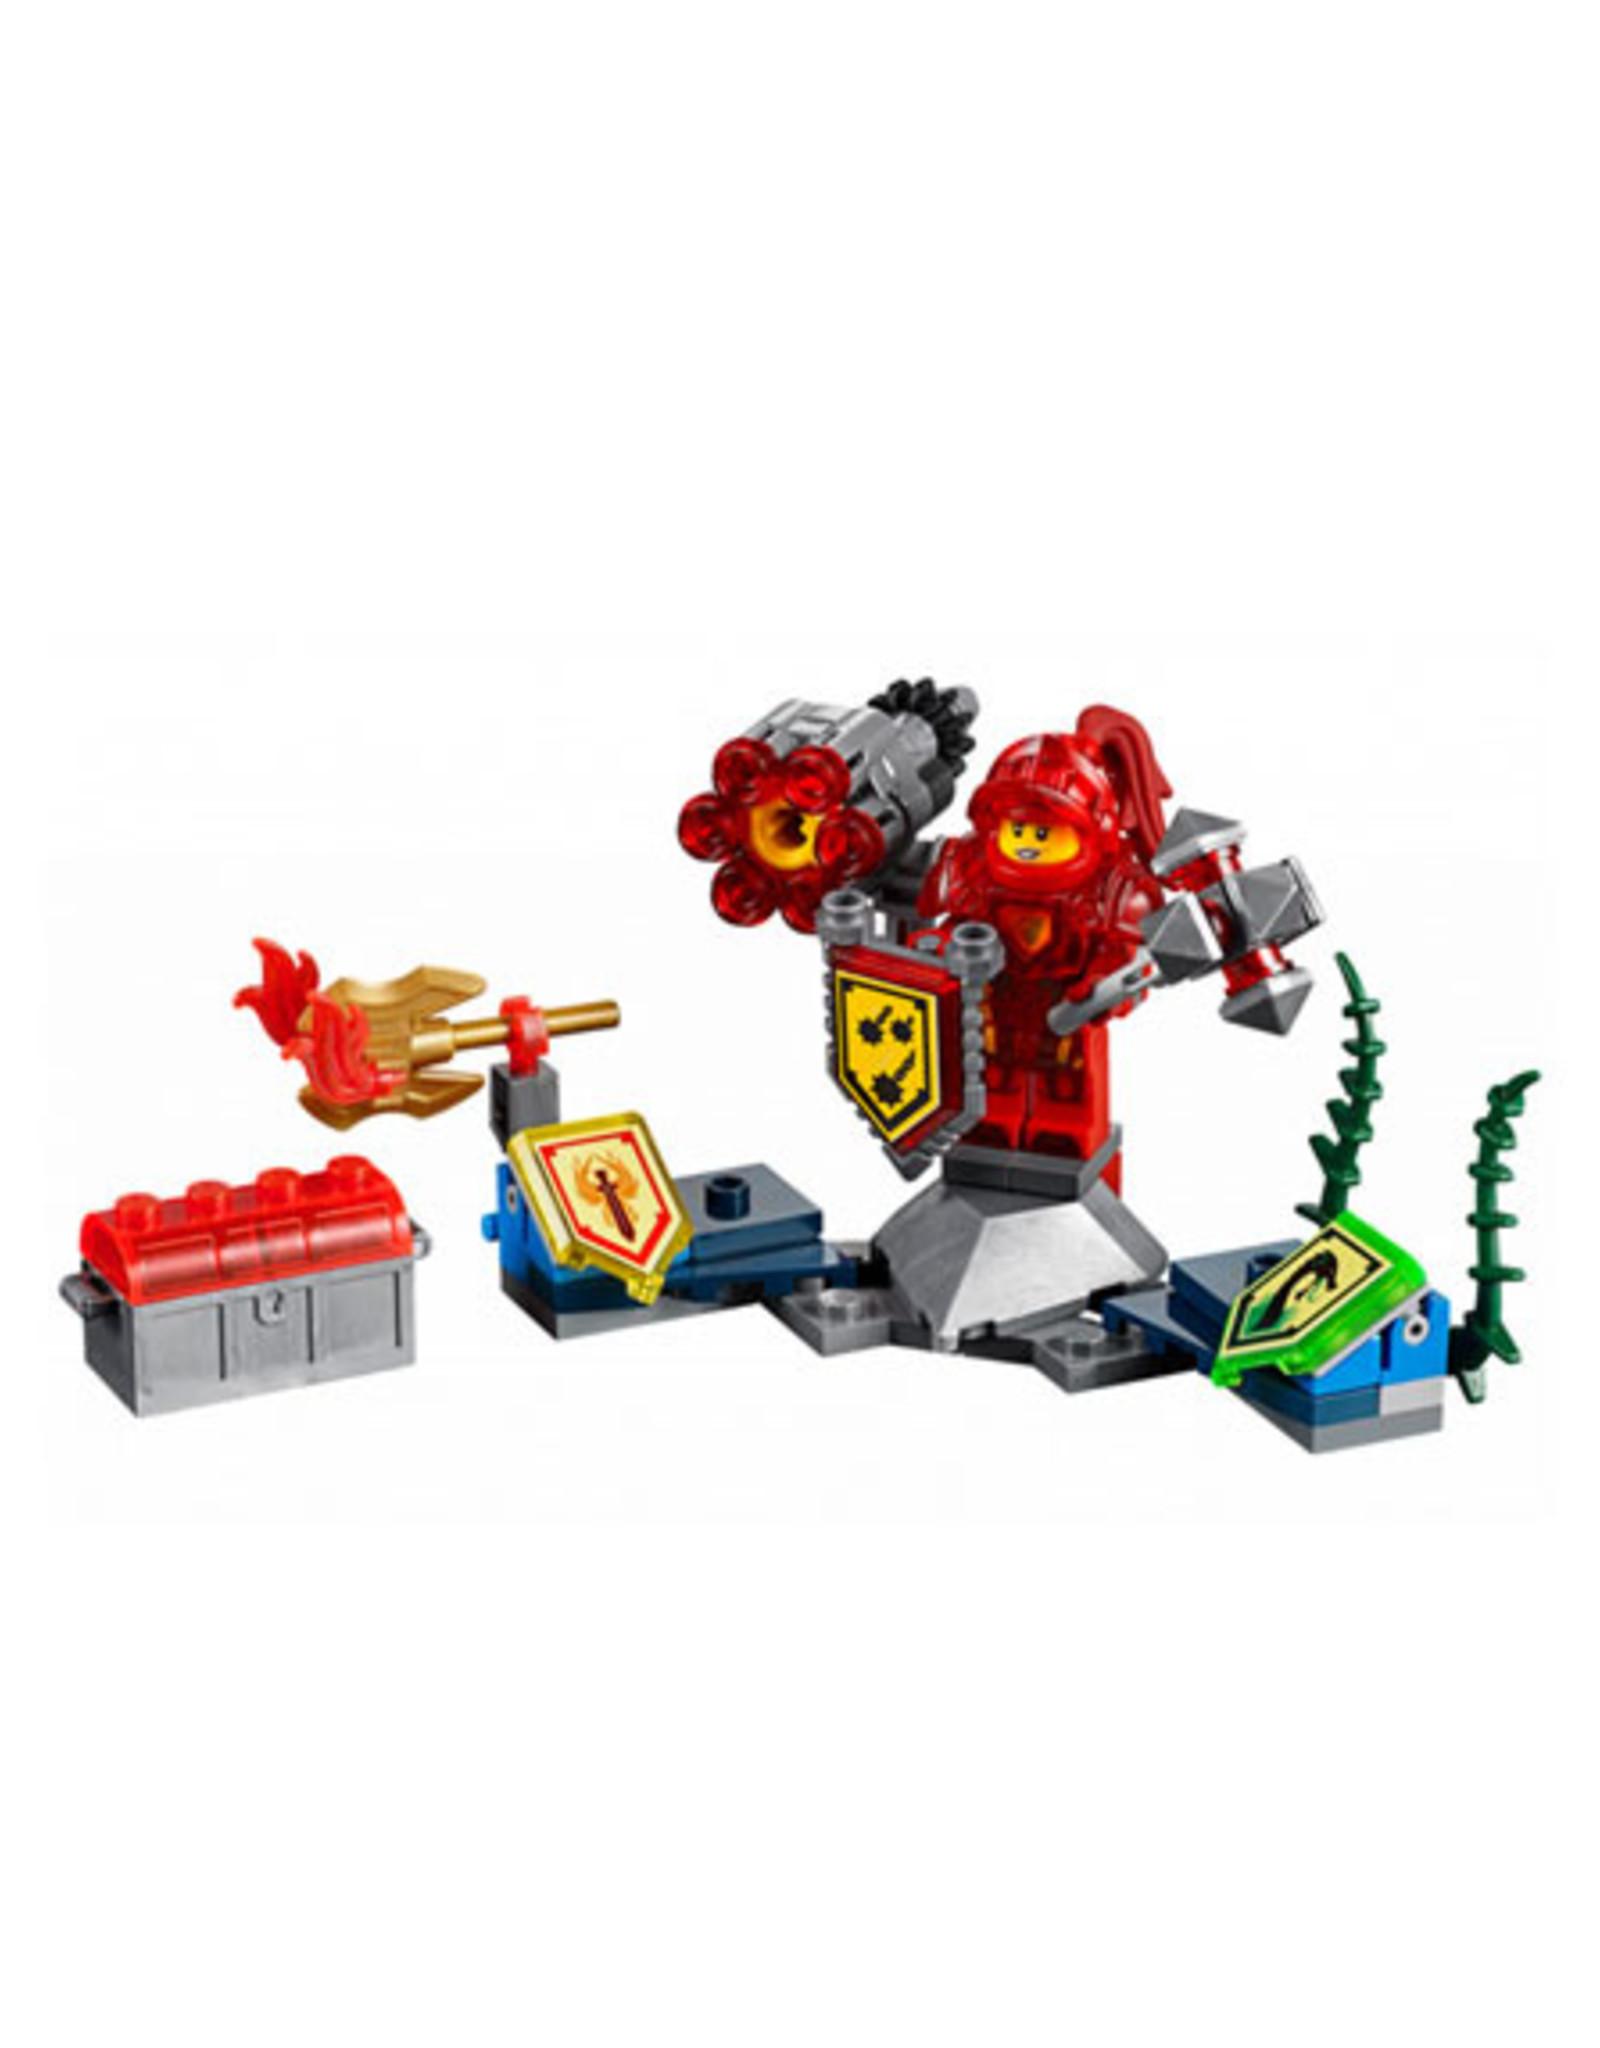 LEGO LEGO 70331 Ultimate Macy NEXO KNIGHTS